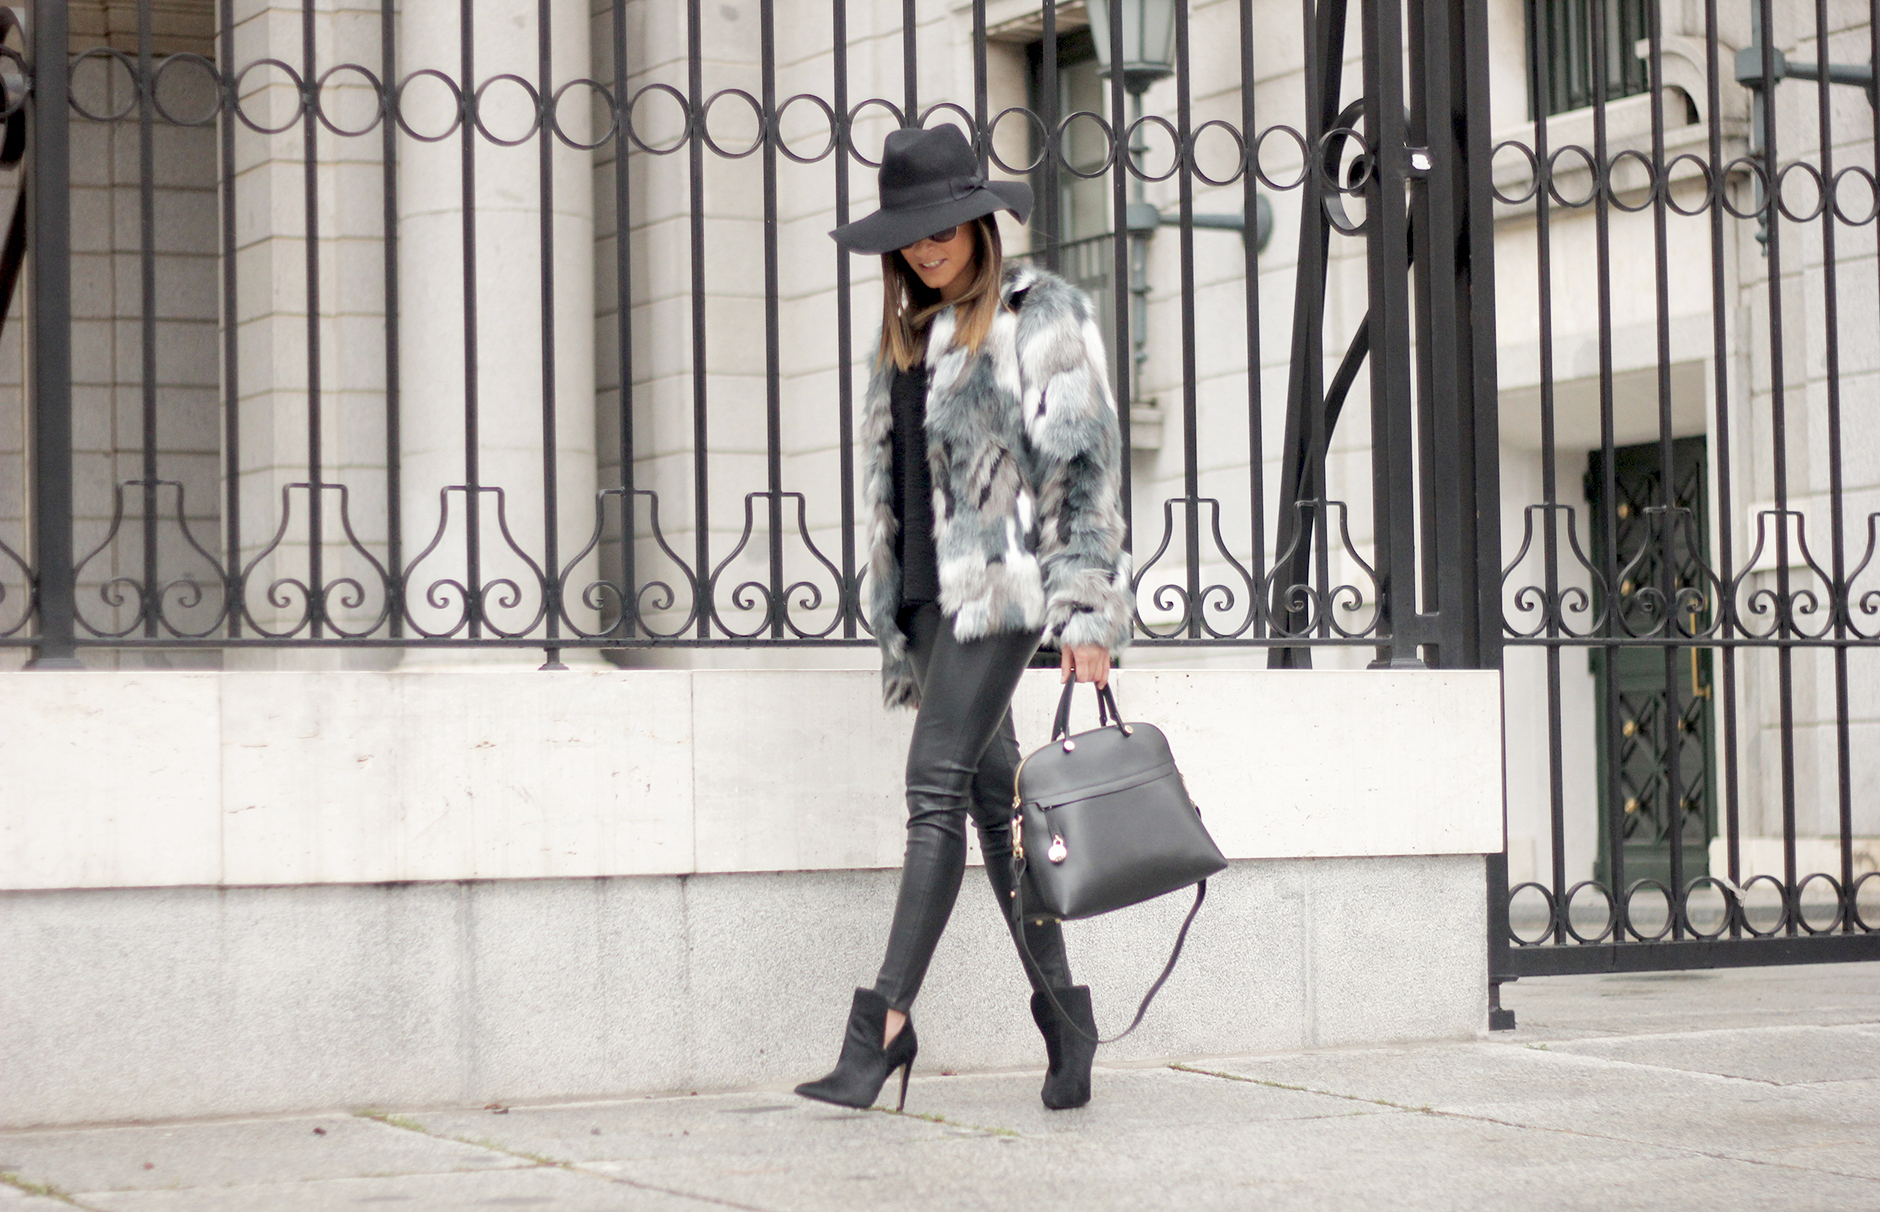 Faux fur coat leatherette pants booties black hat mango streetstyle fashion outfit17